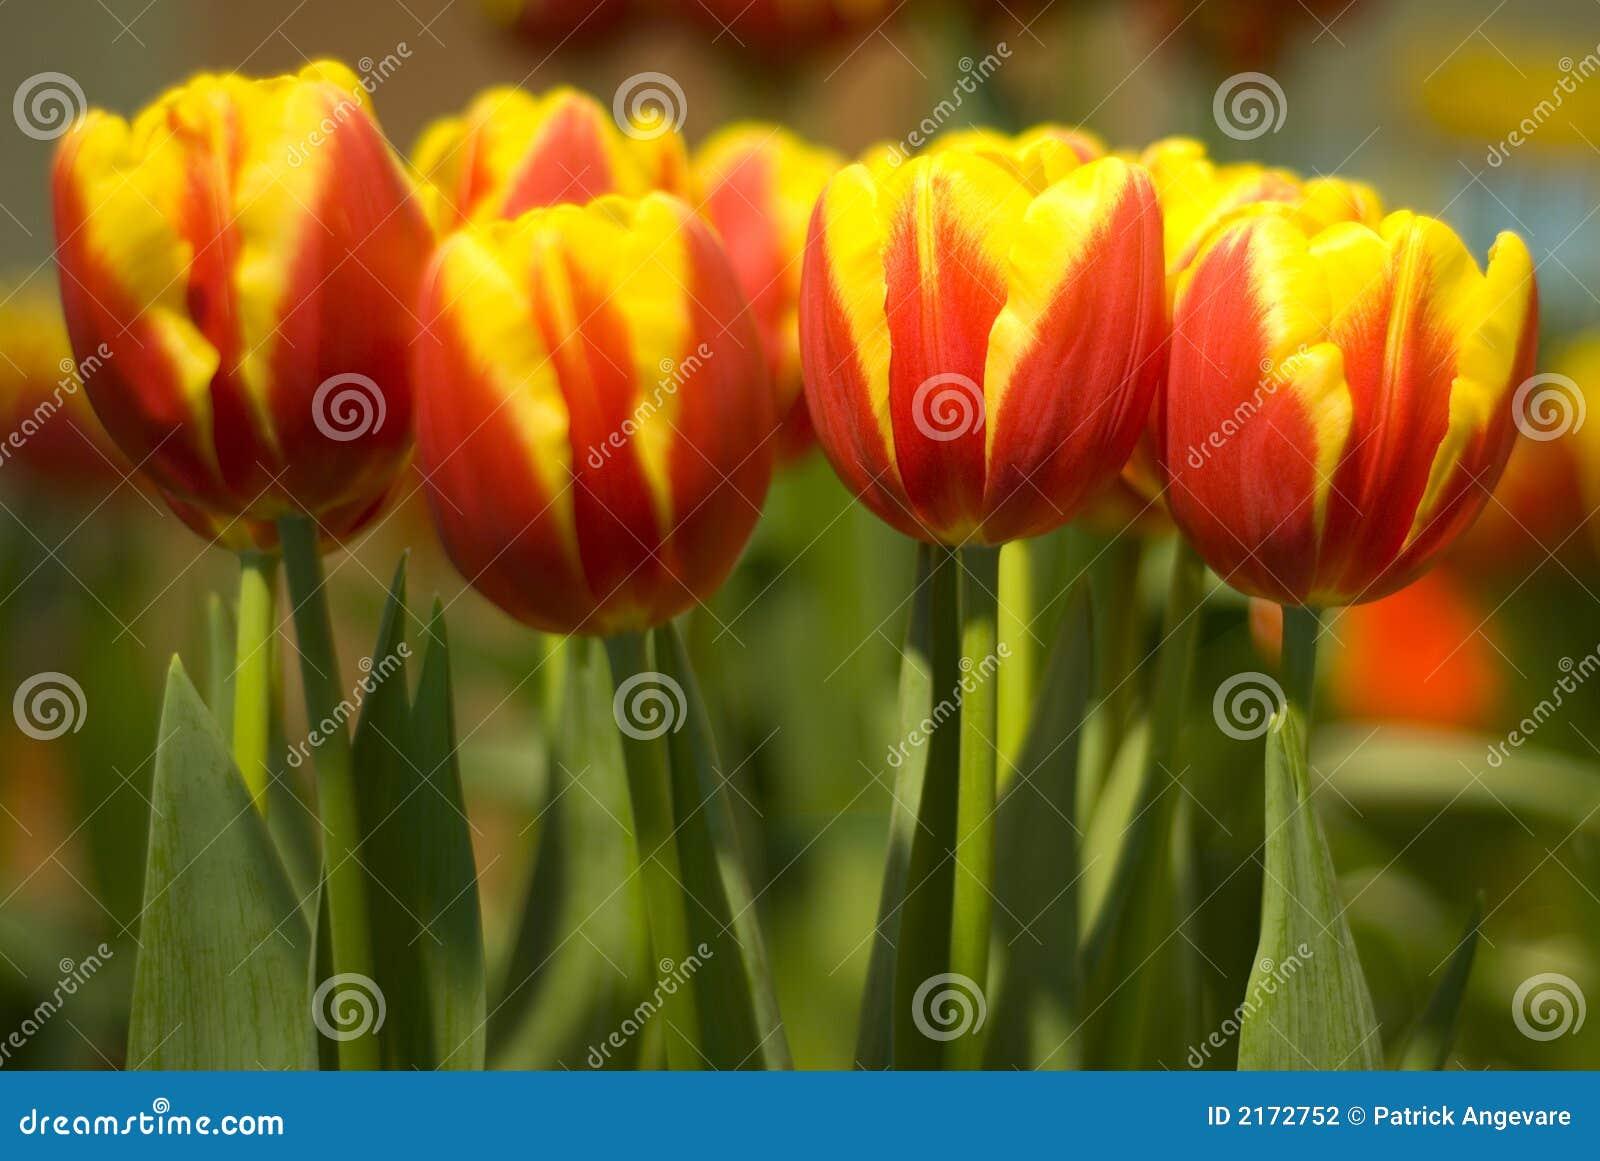 Tulipani giallo arancione fotografia stock immagine 2172752 for Tulipani arancioni